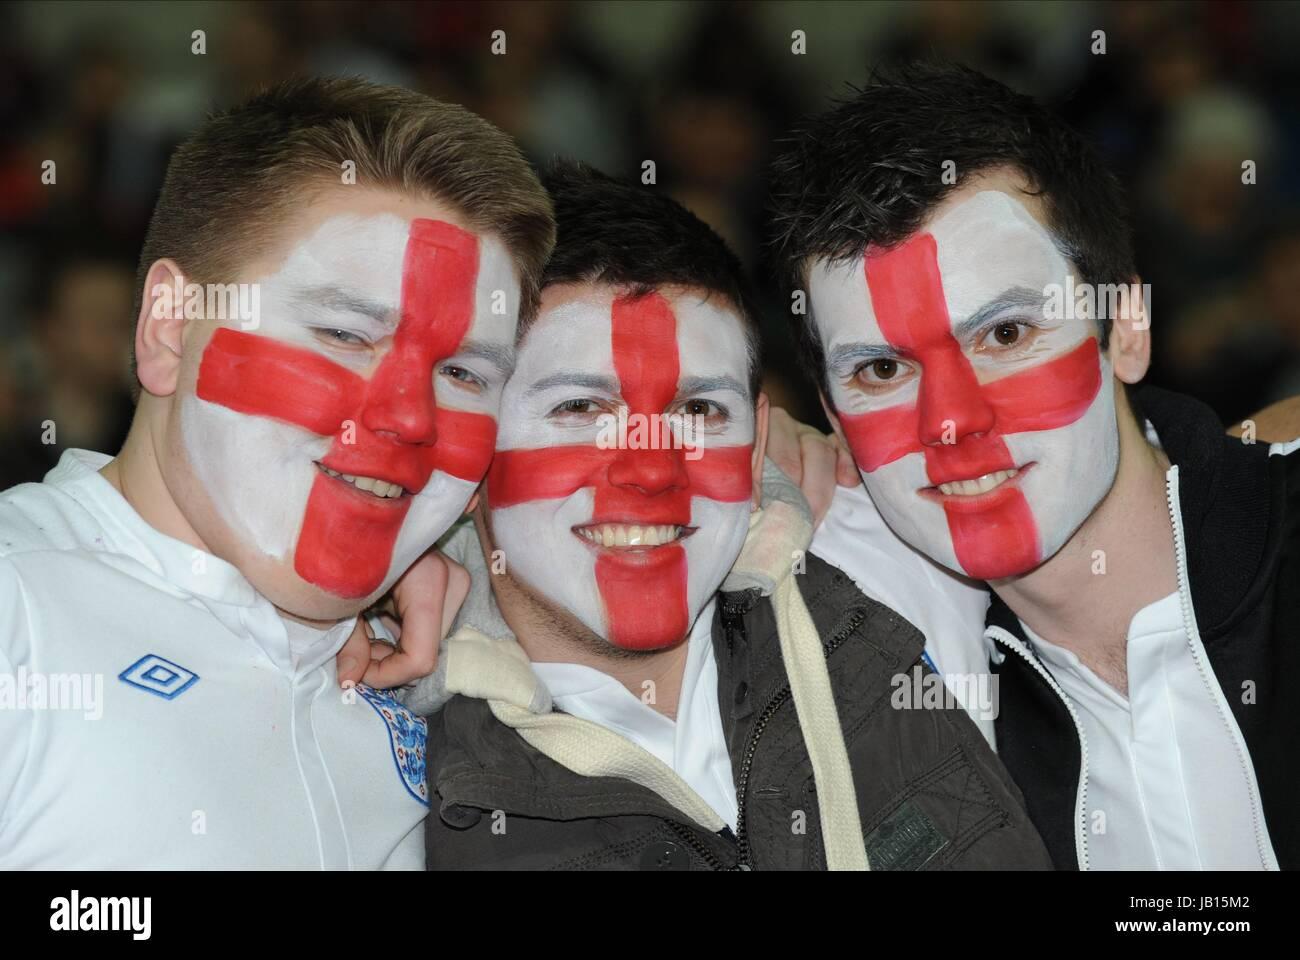 ENGLAND FANS WITH PAINTED FACE ENGLAND V HOLLAND WEMBLEY STADIUM LONDON ENGLAND 29 February 2012 - Stock Image